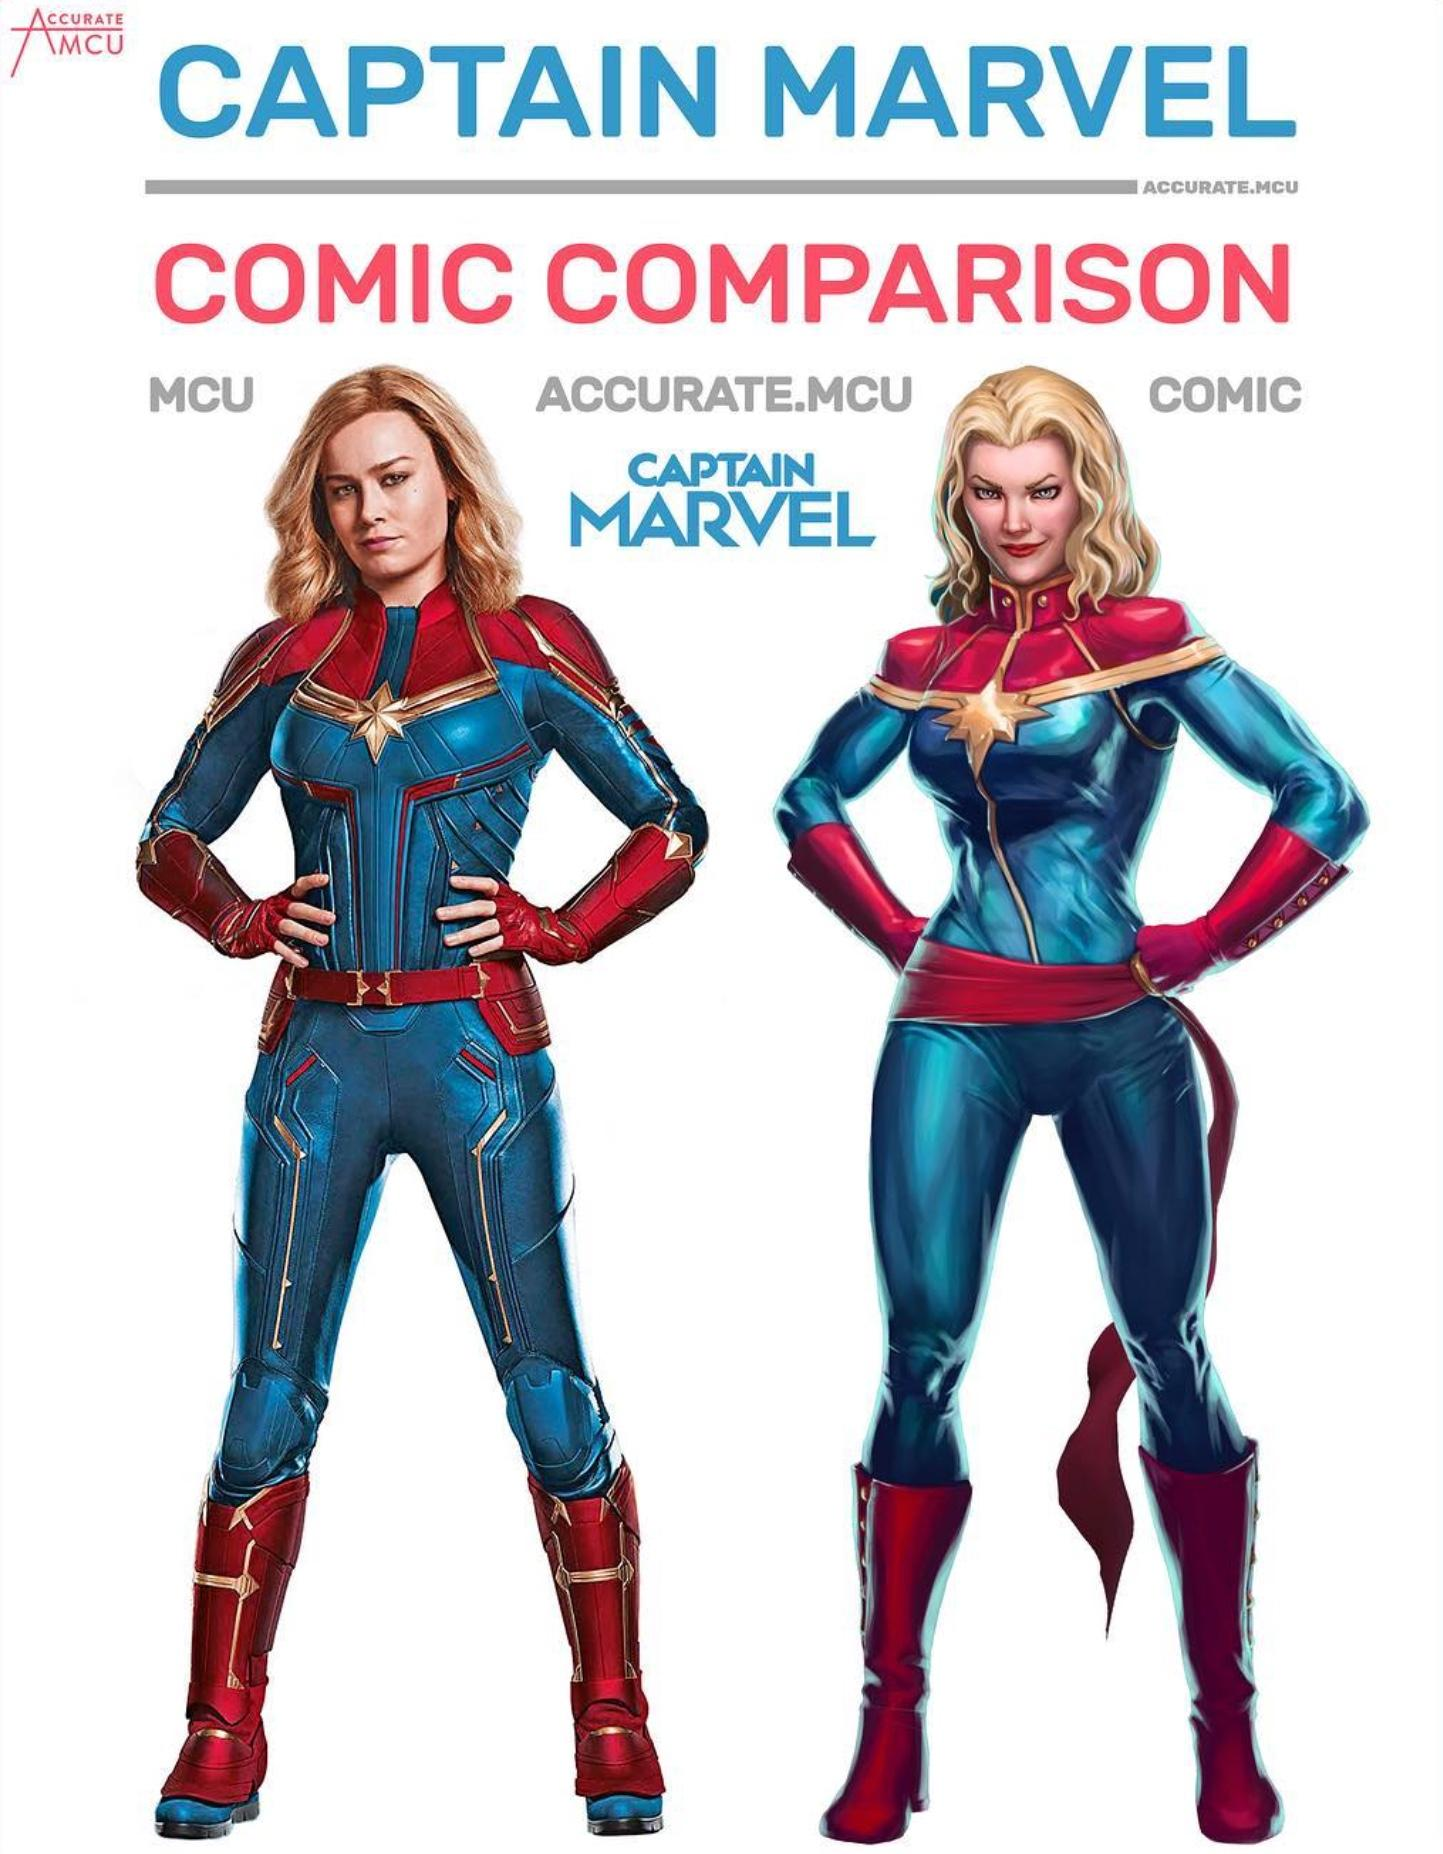 the comparison between mcu captain marvel and comic captain marvel